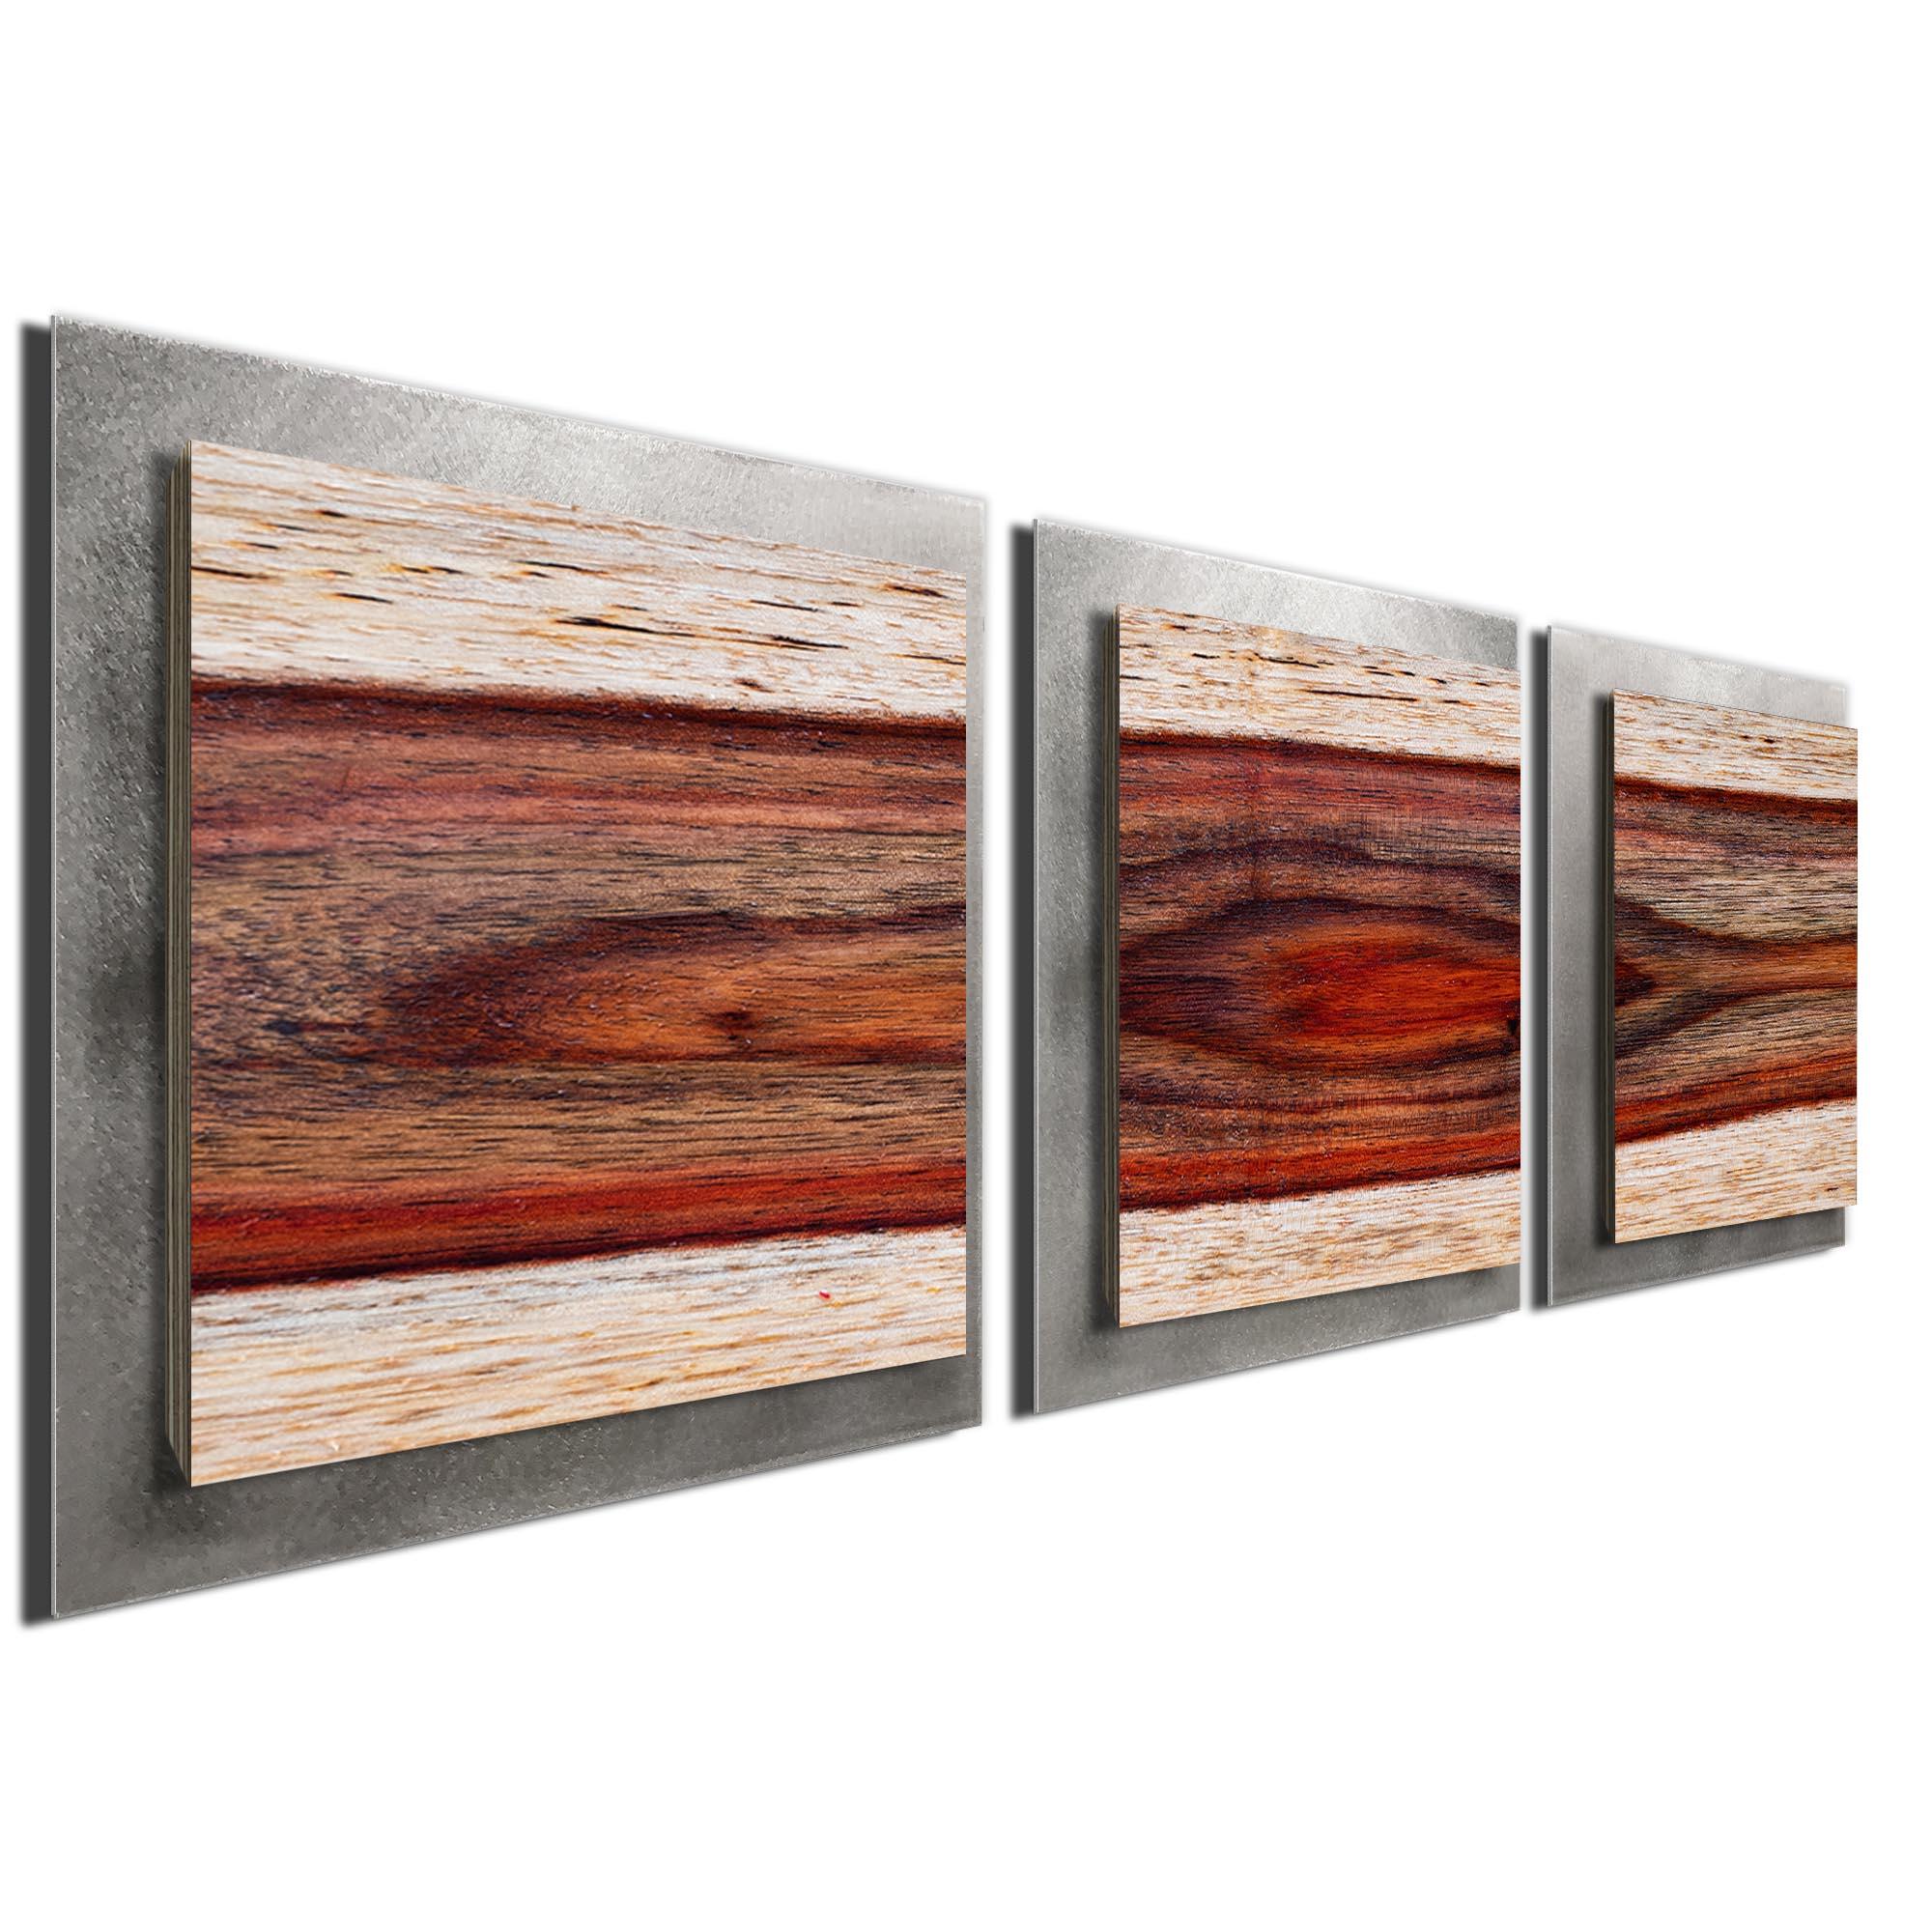 Auburn Wood Essence Silver by Adam Schwoeppe Rustic Modern Style Wood Wall Art - Image 2